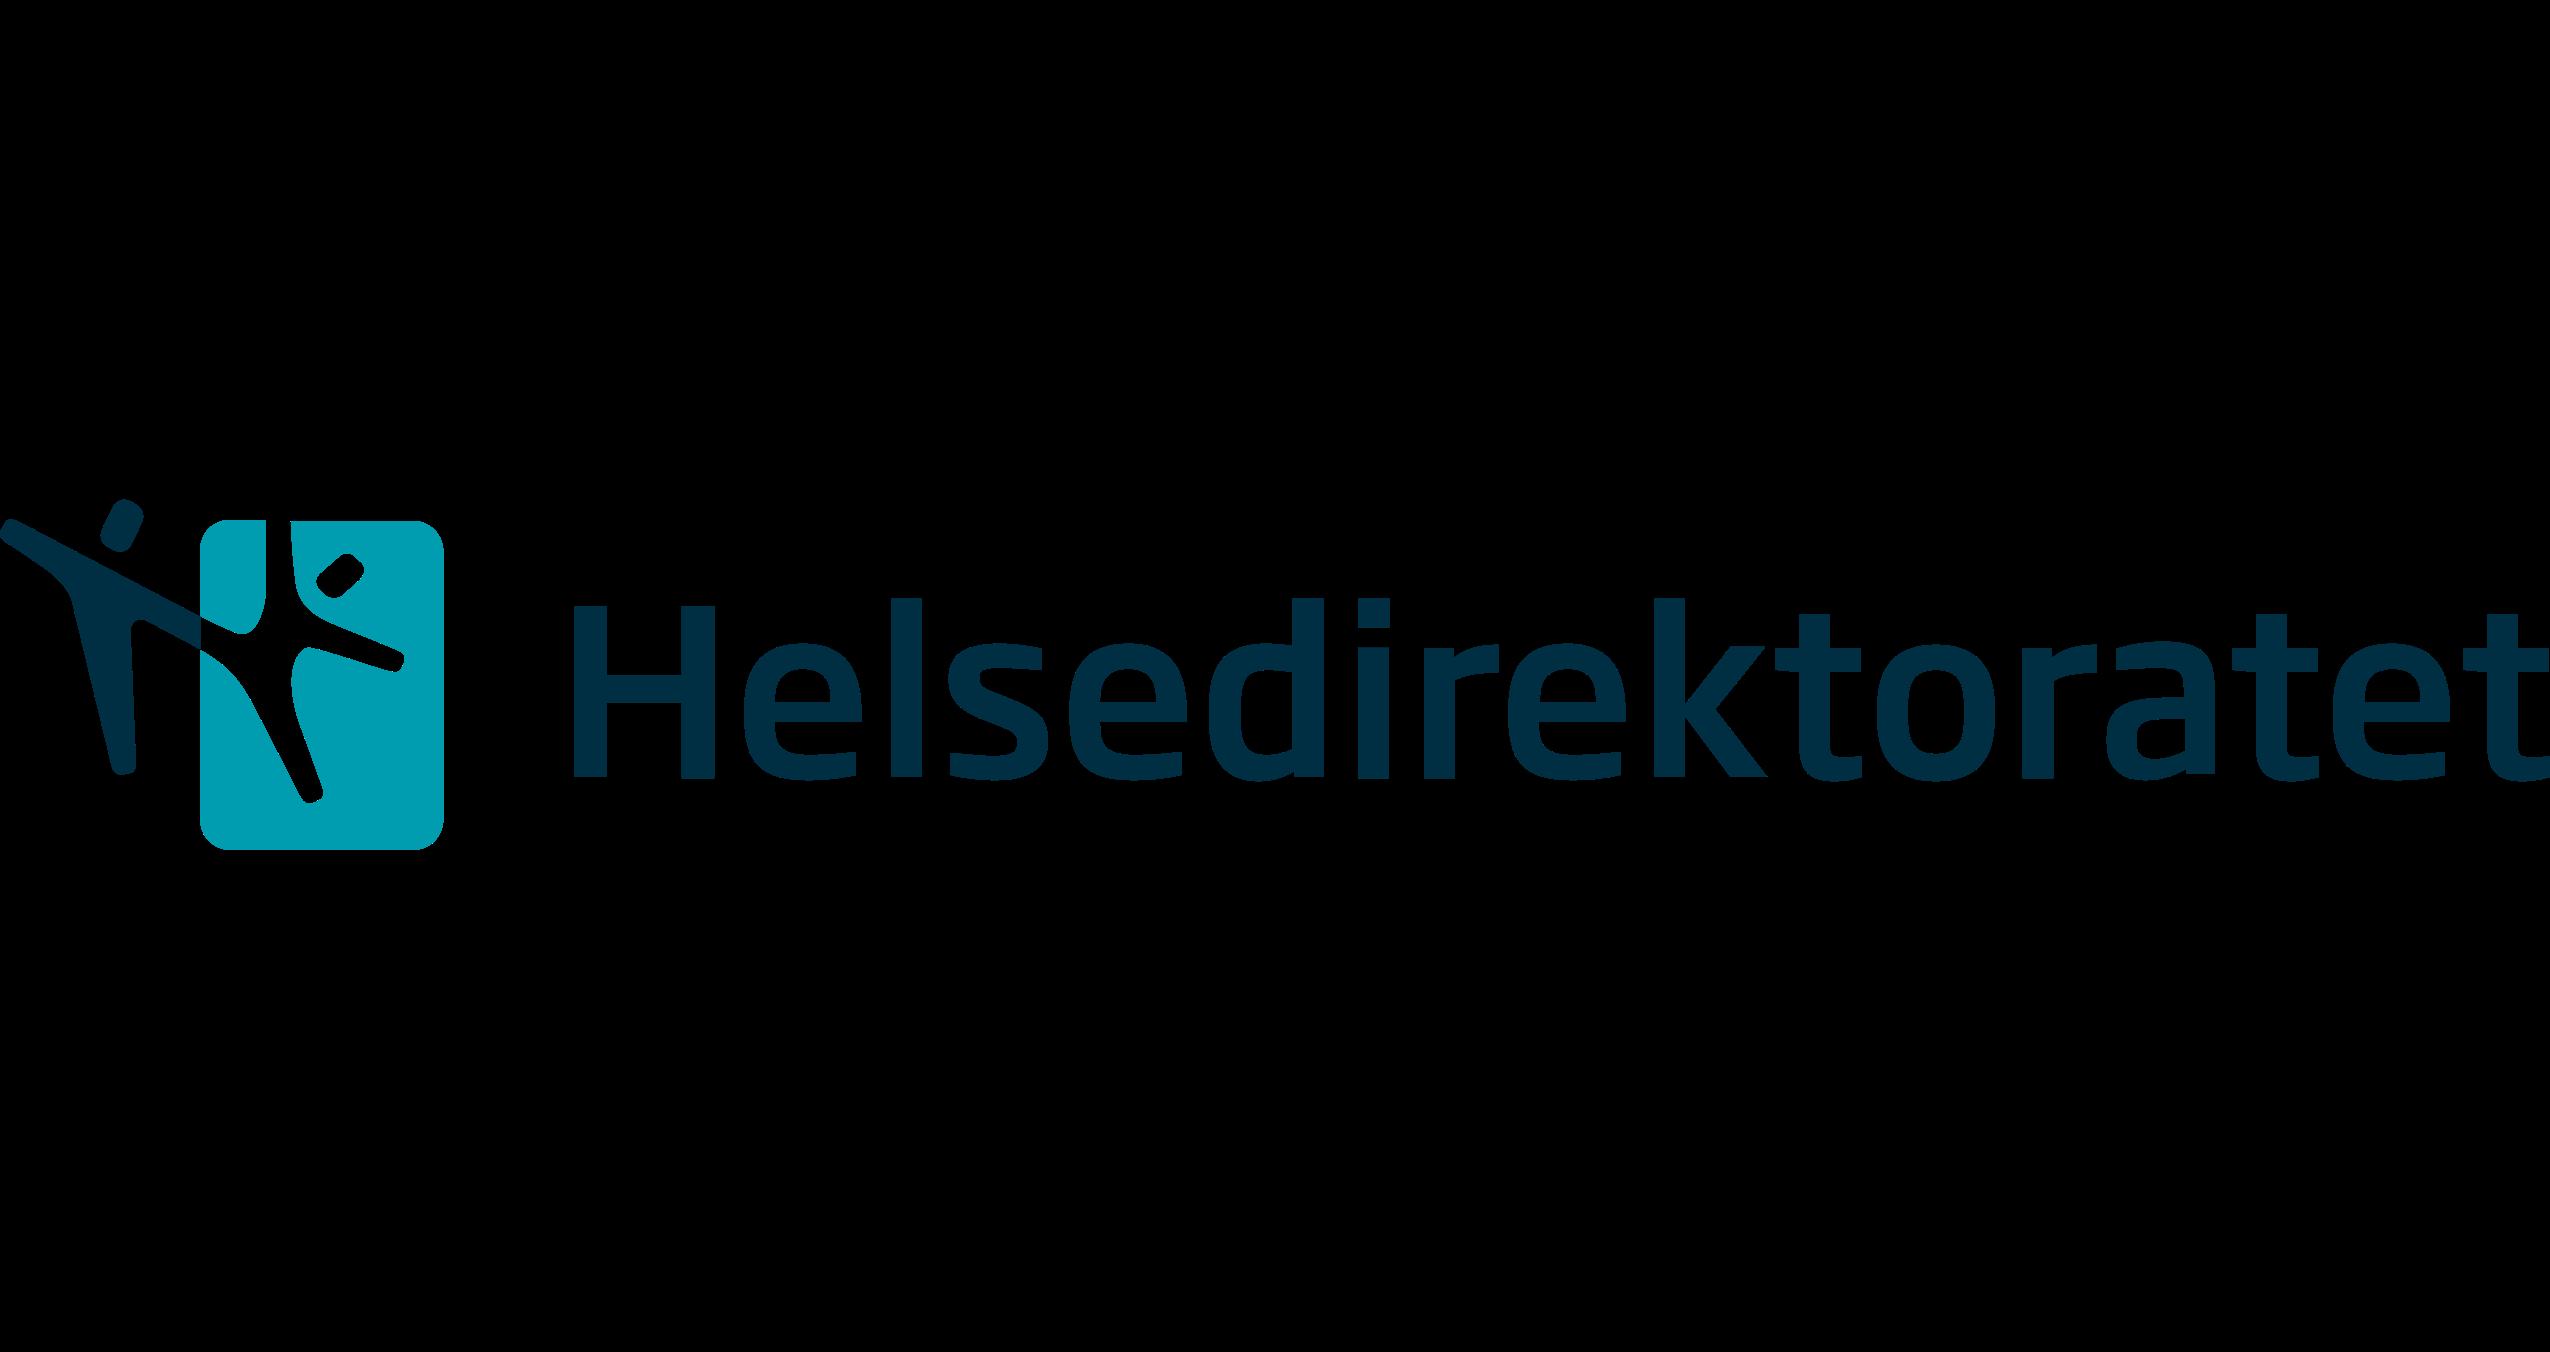 Logo Helsedirektoratet (image)